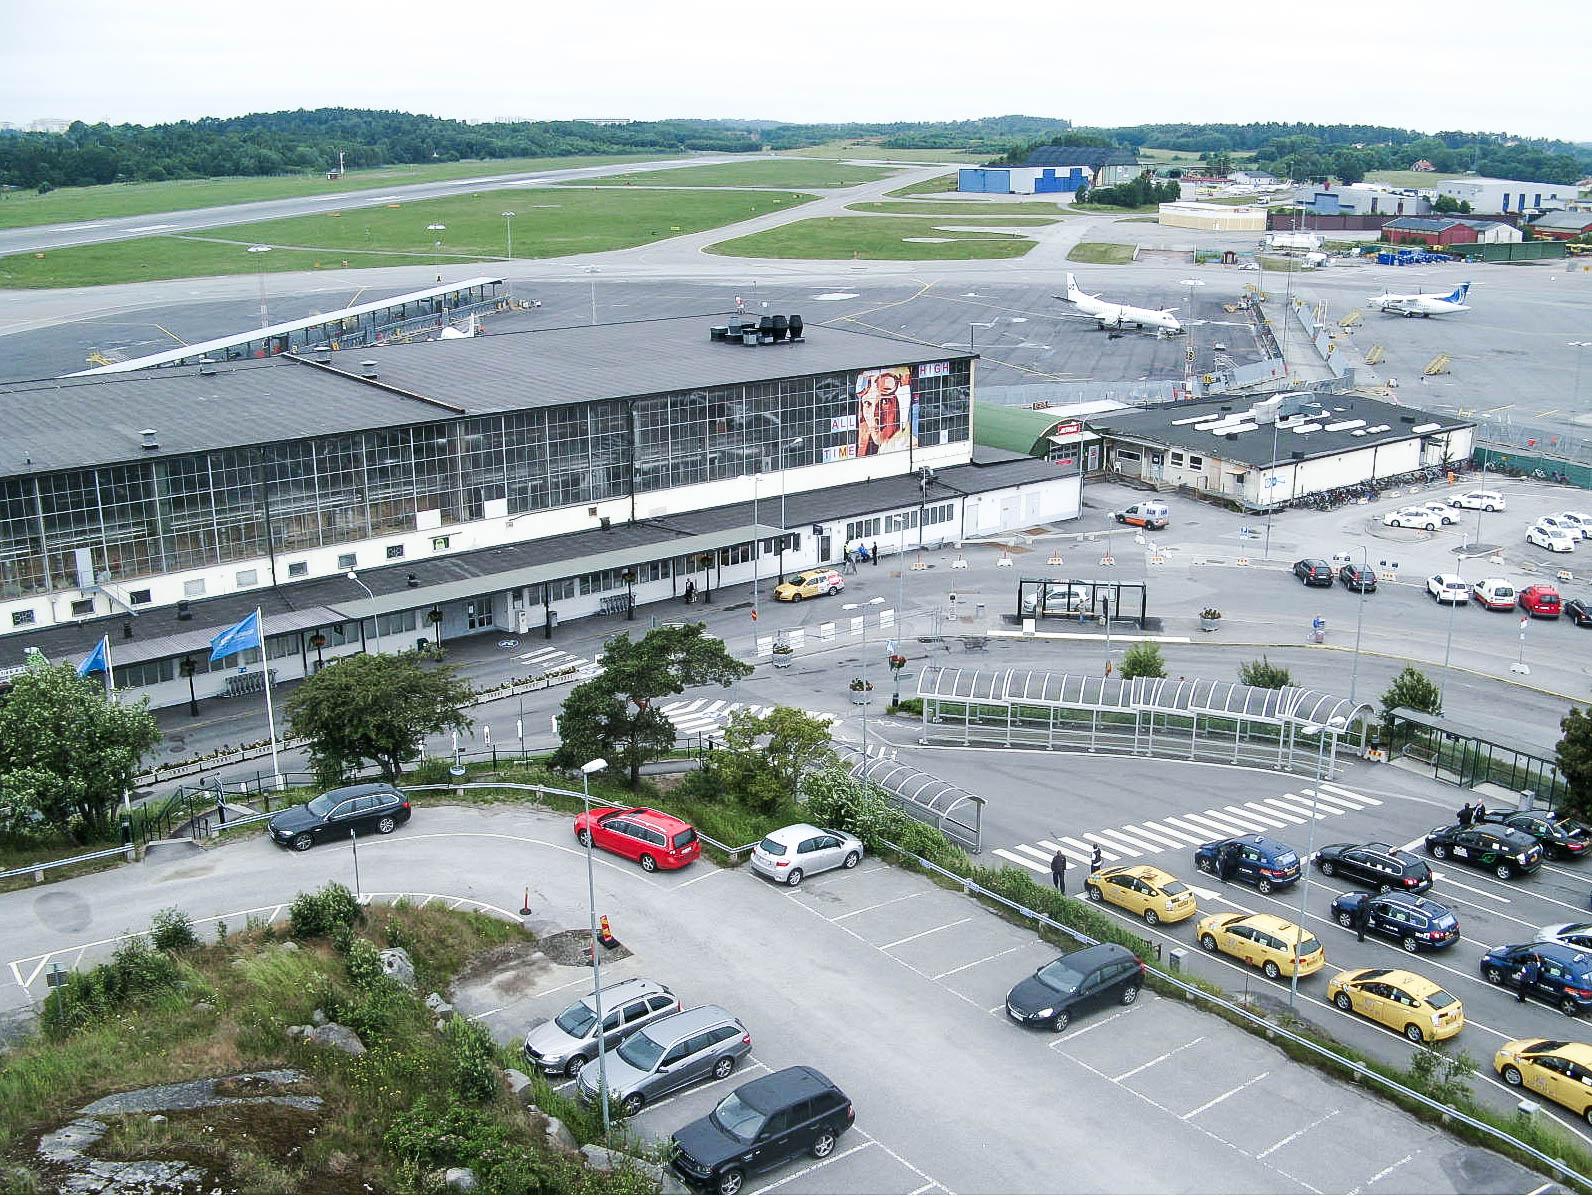 Stockholm Bromma Airport - Airport Development Planning